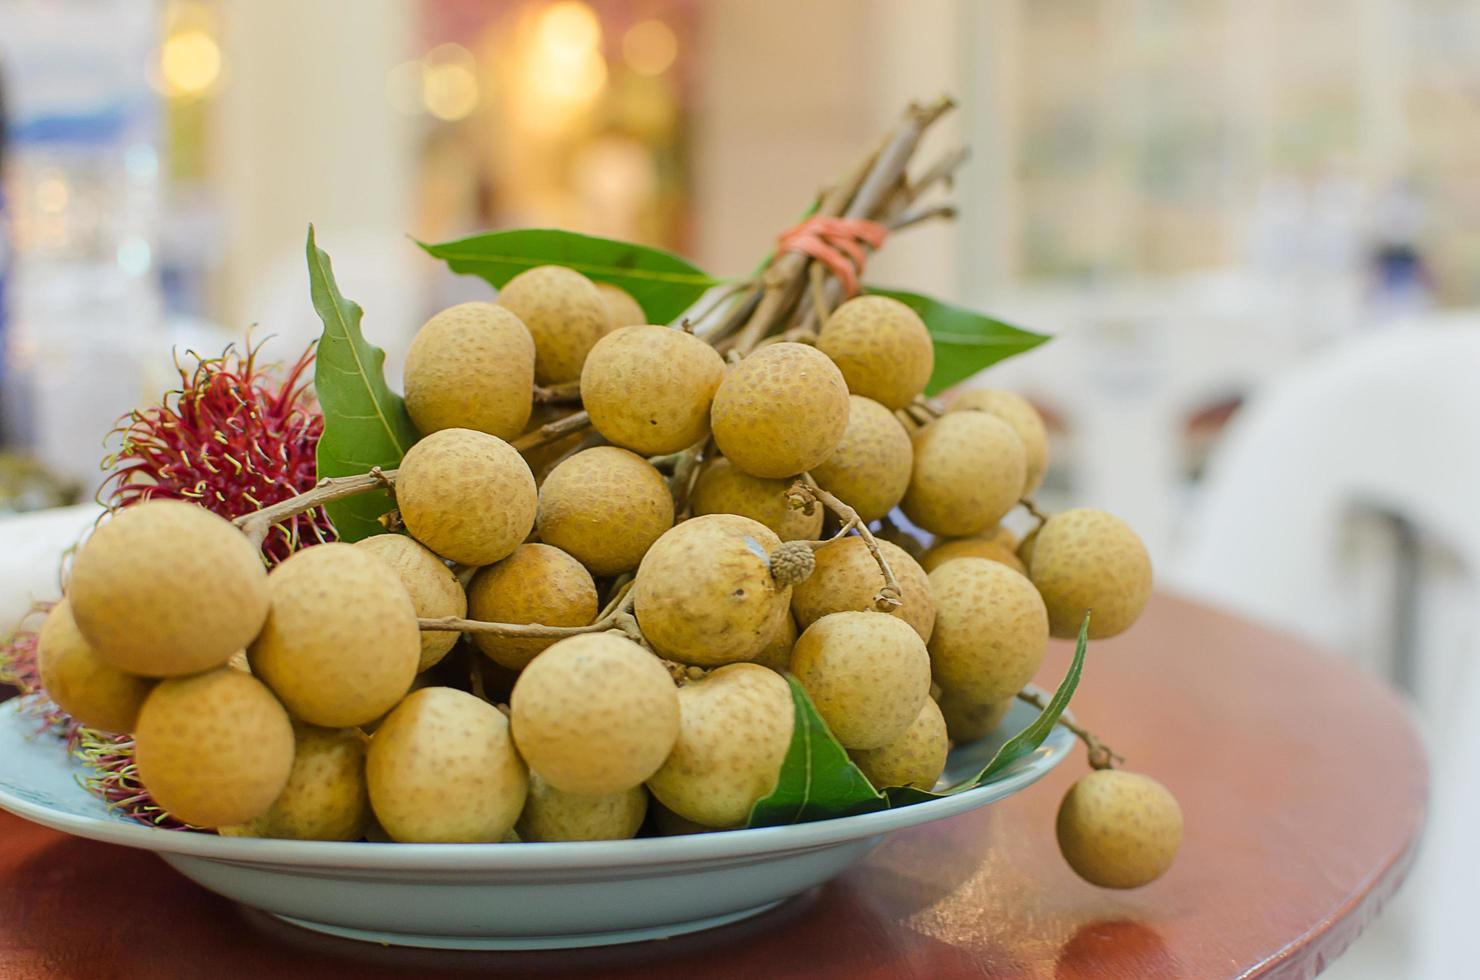 longan fruit in een kom foto